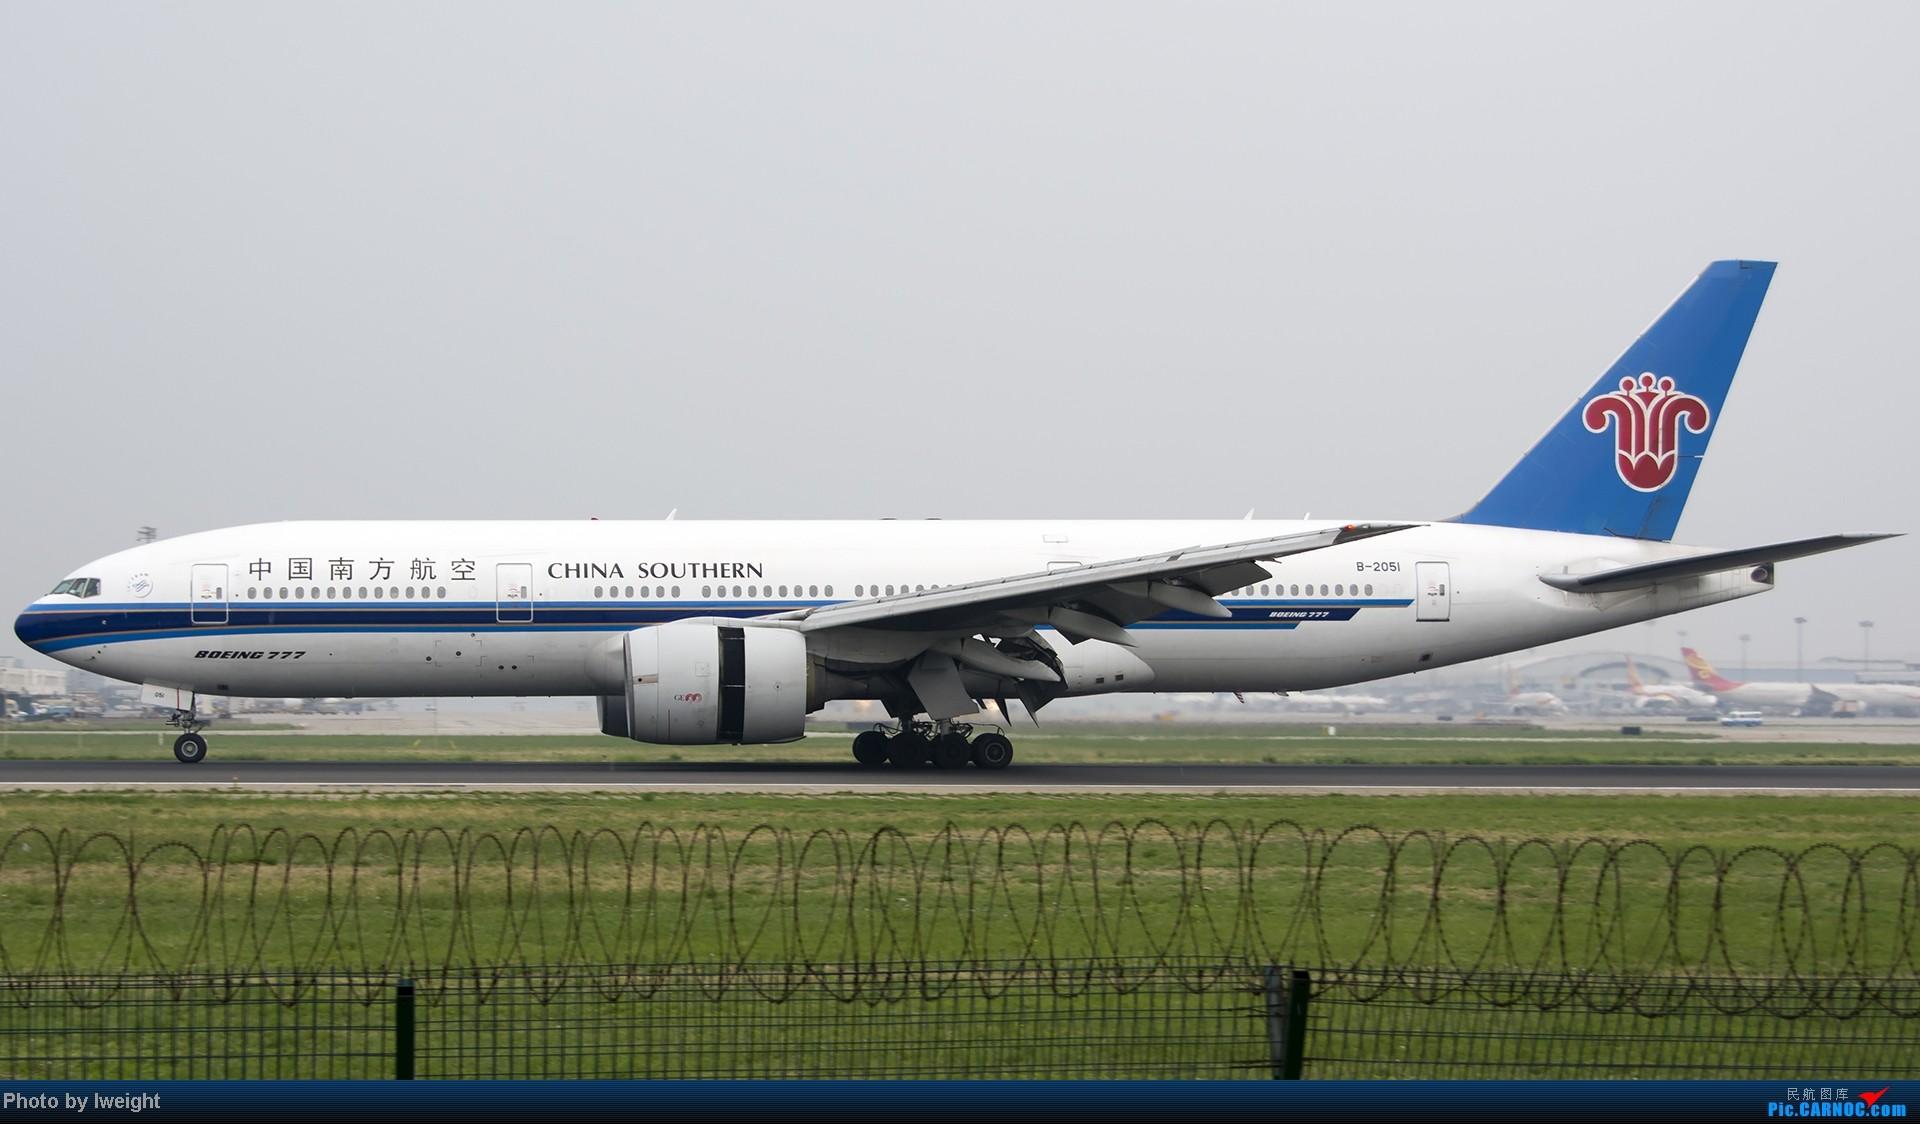 Re:[原创]休假无聊,跑道边来拍机玩(晚点的ZestAir、换装的B6100和刚交付的B2738等) BOEING 777-200 B-2051 中国北京首都机场